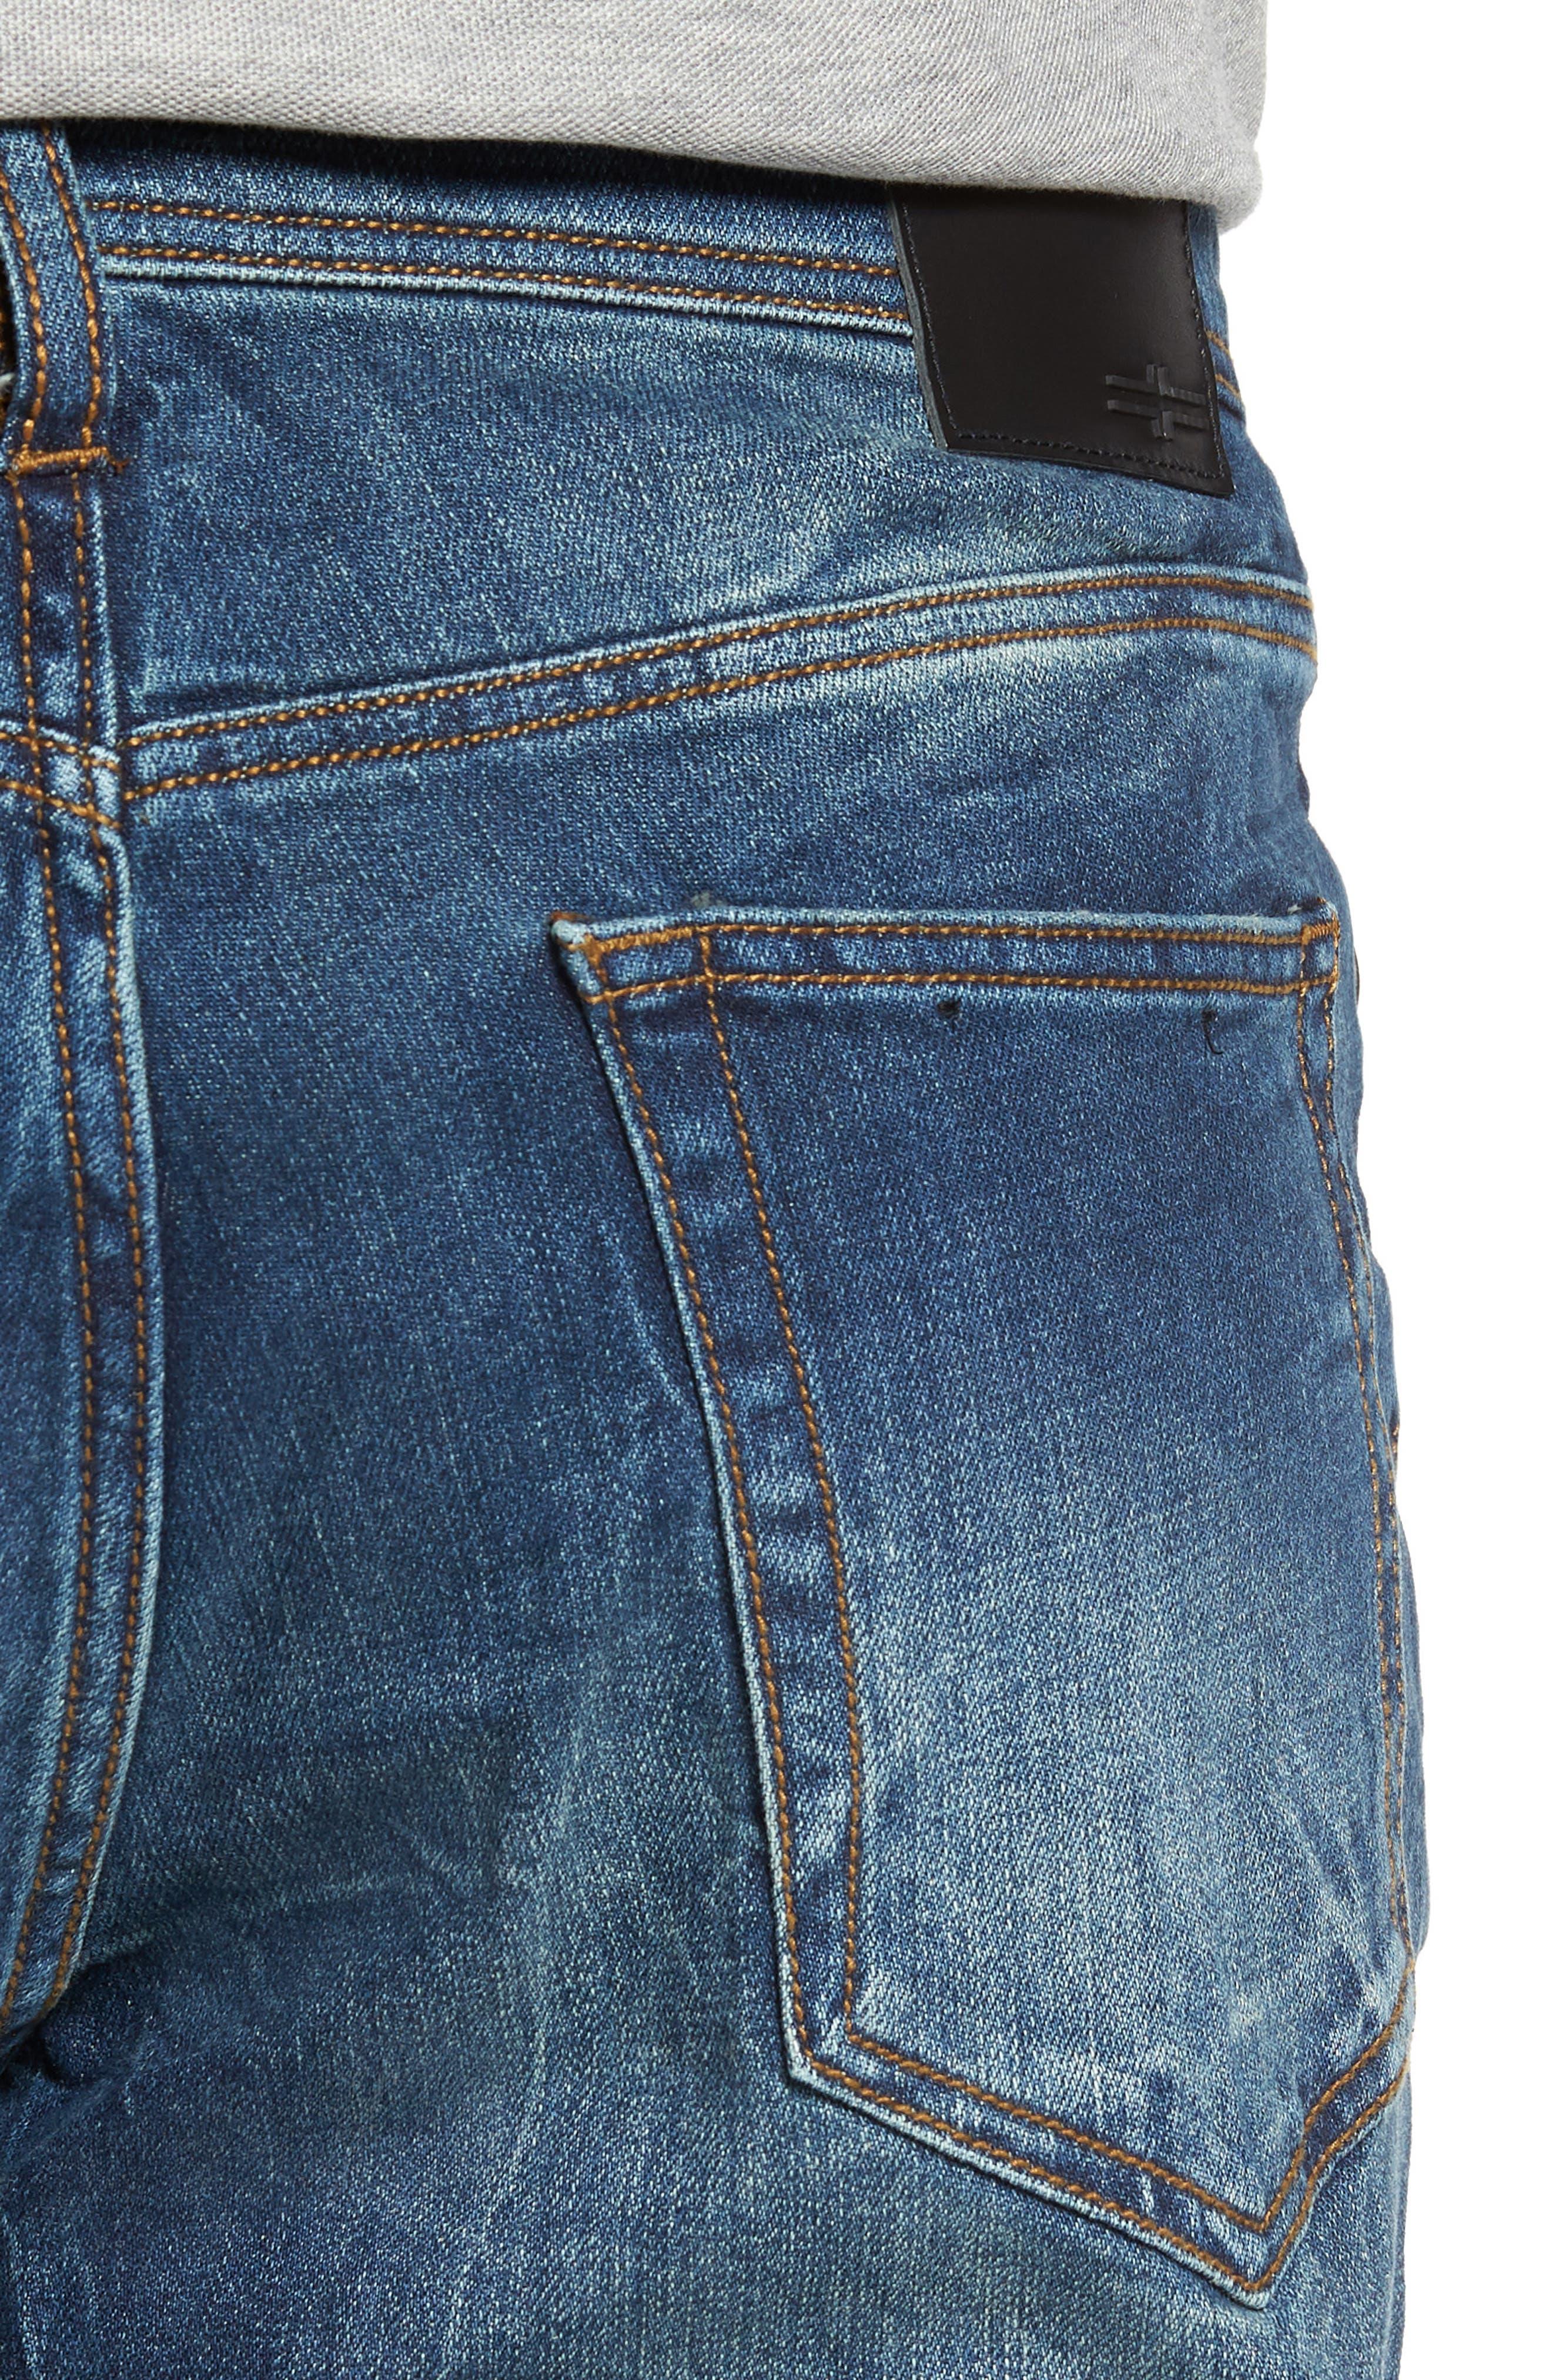 Jeans Co. Regent Relaxed Fit Jeans,                             Alternate thumbnail 4, color,                             Odessa Vintage Medium